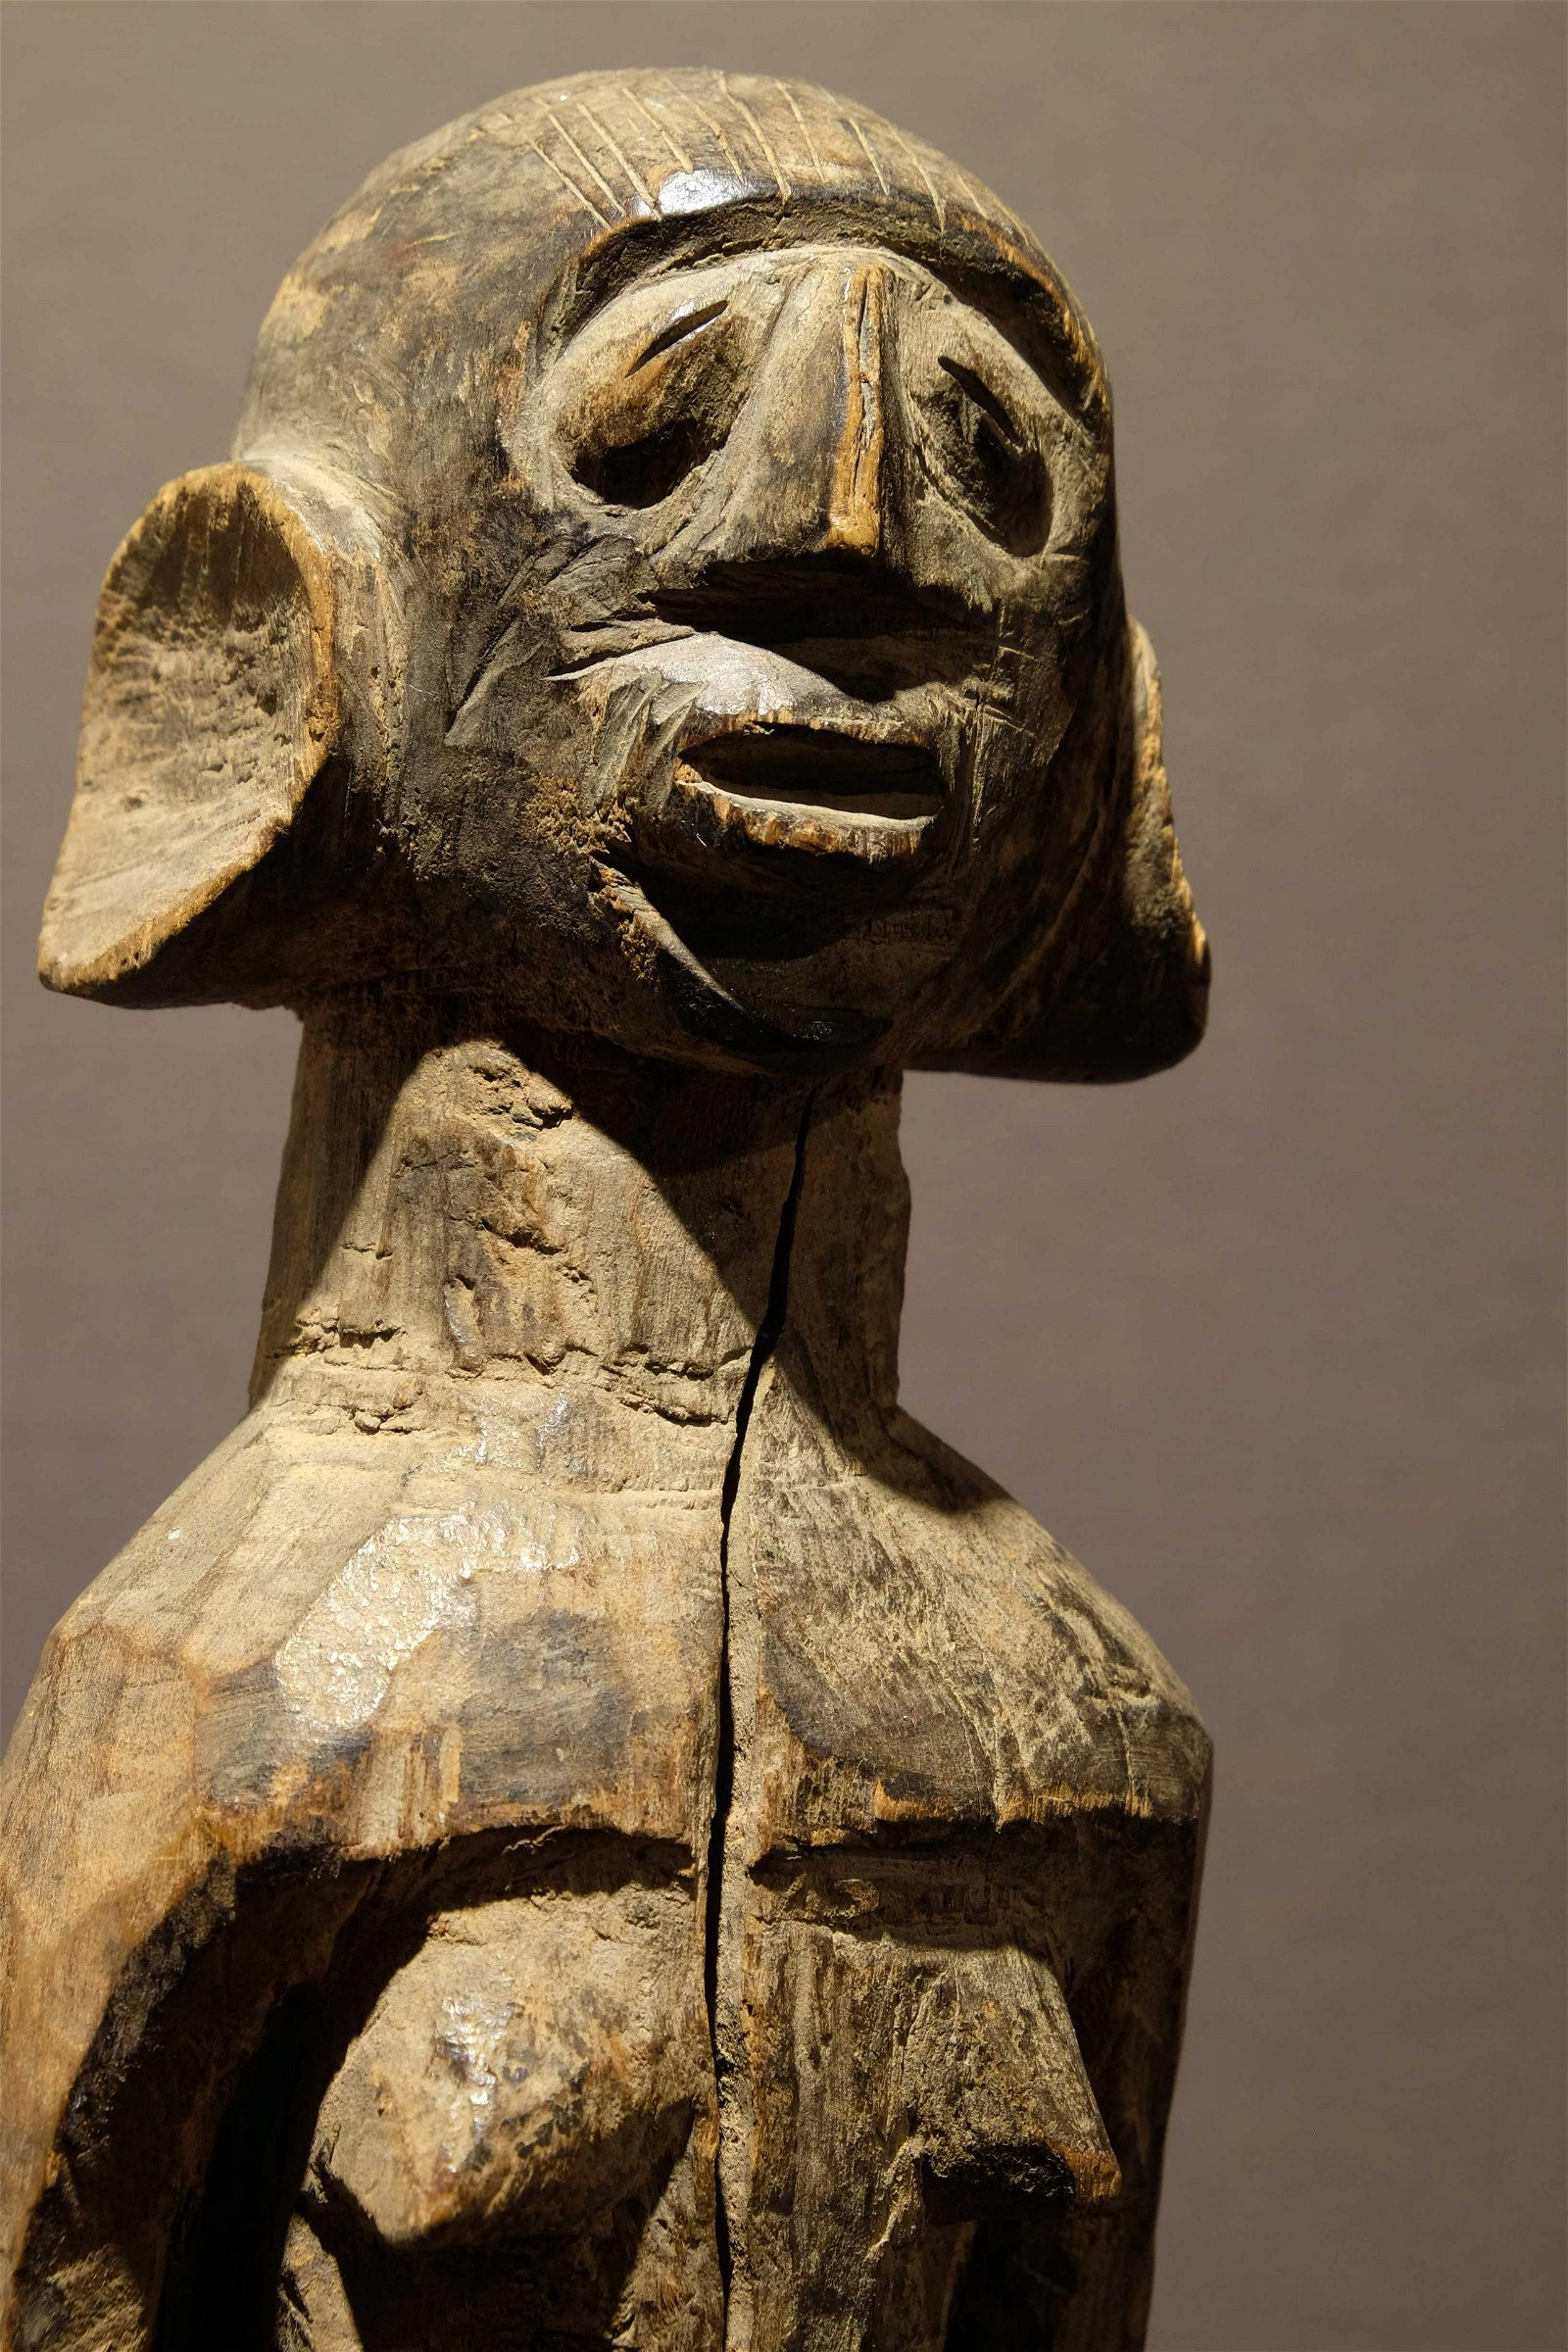 A small Mumuye Figure Prov: Taitt collection